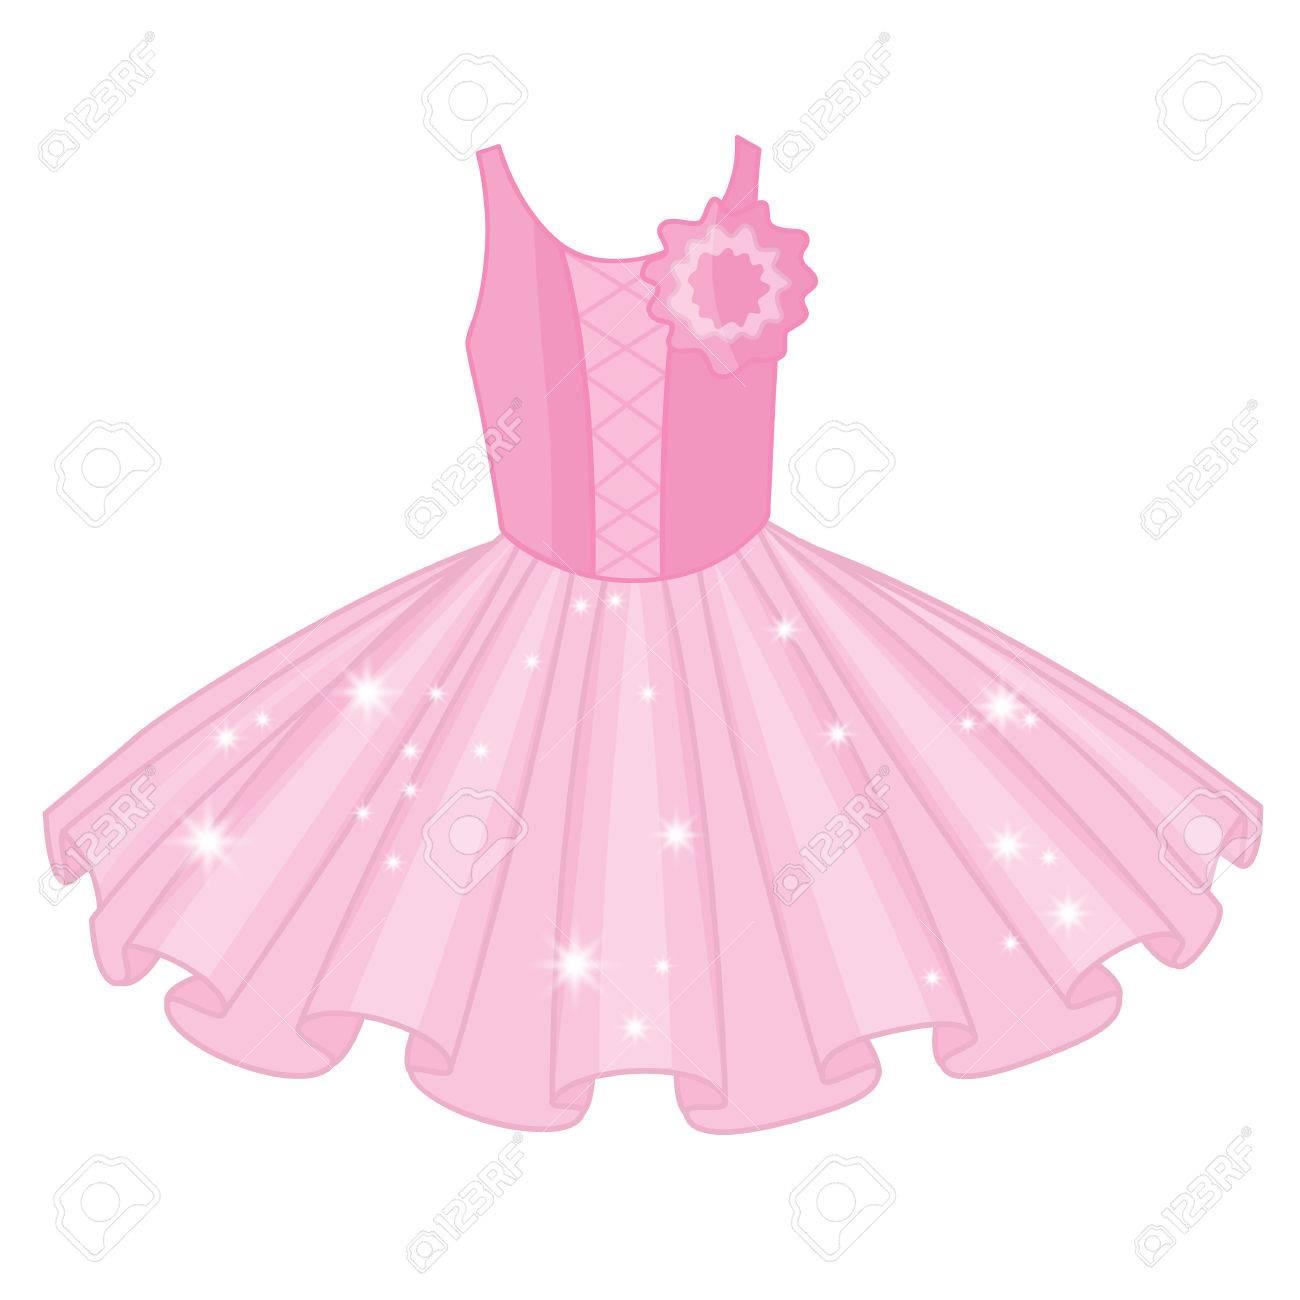 Pink tutu dress costume